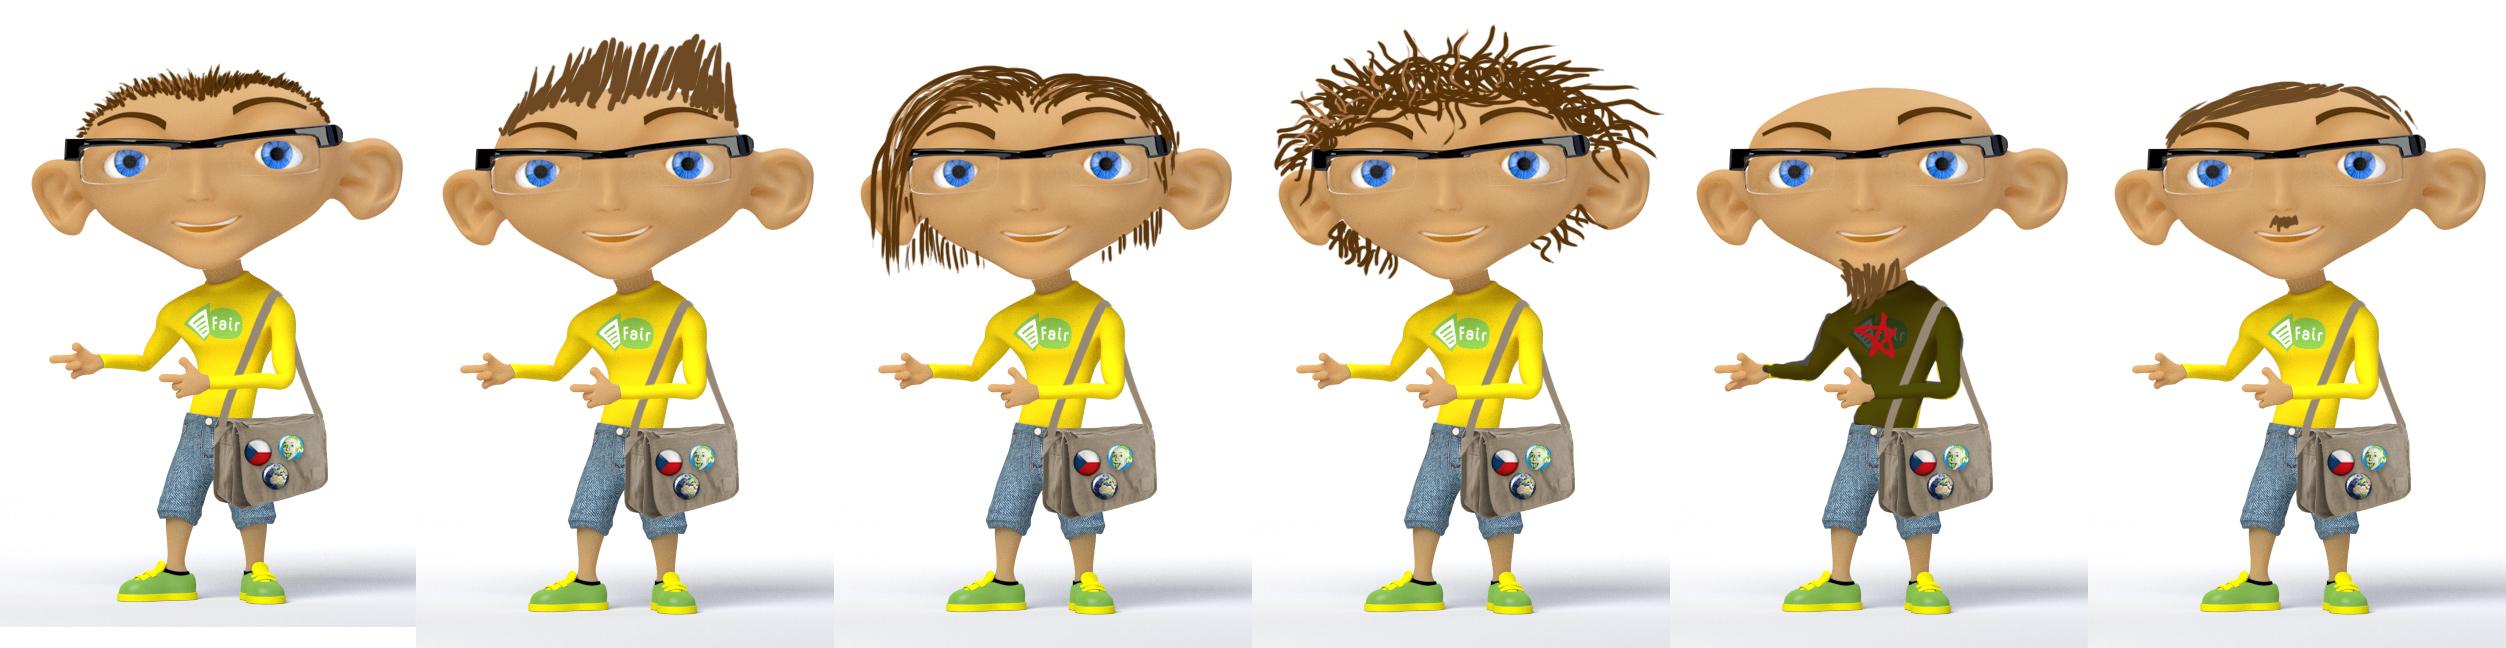 Steve Blender 3D hairstyles